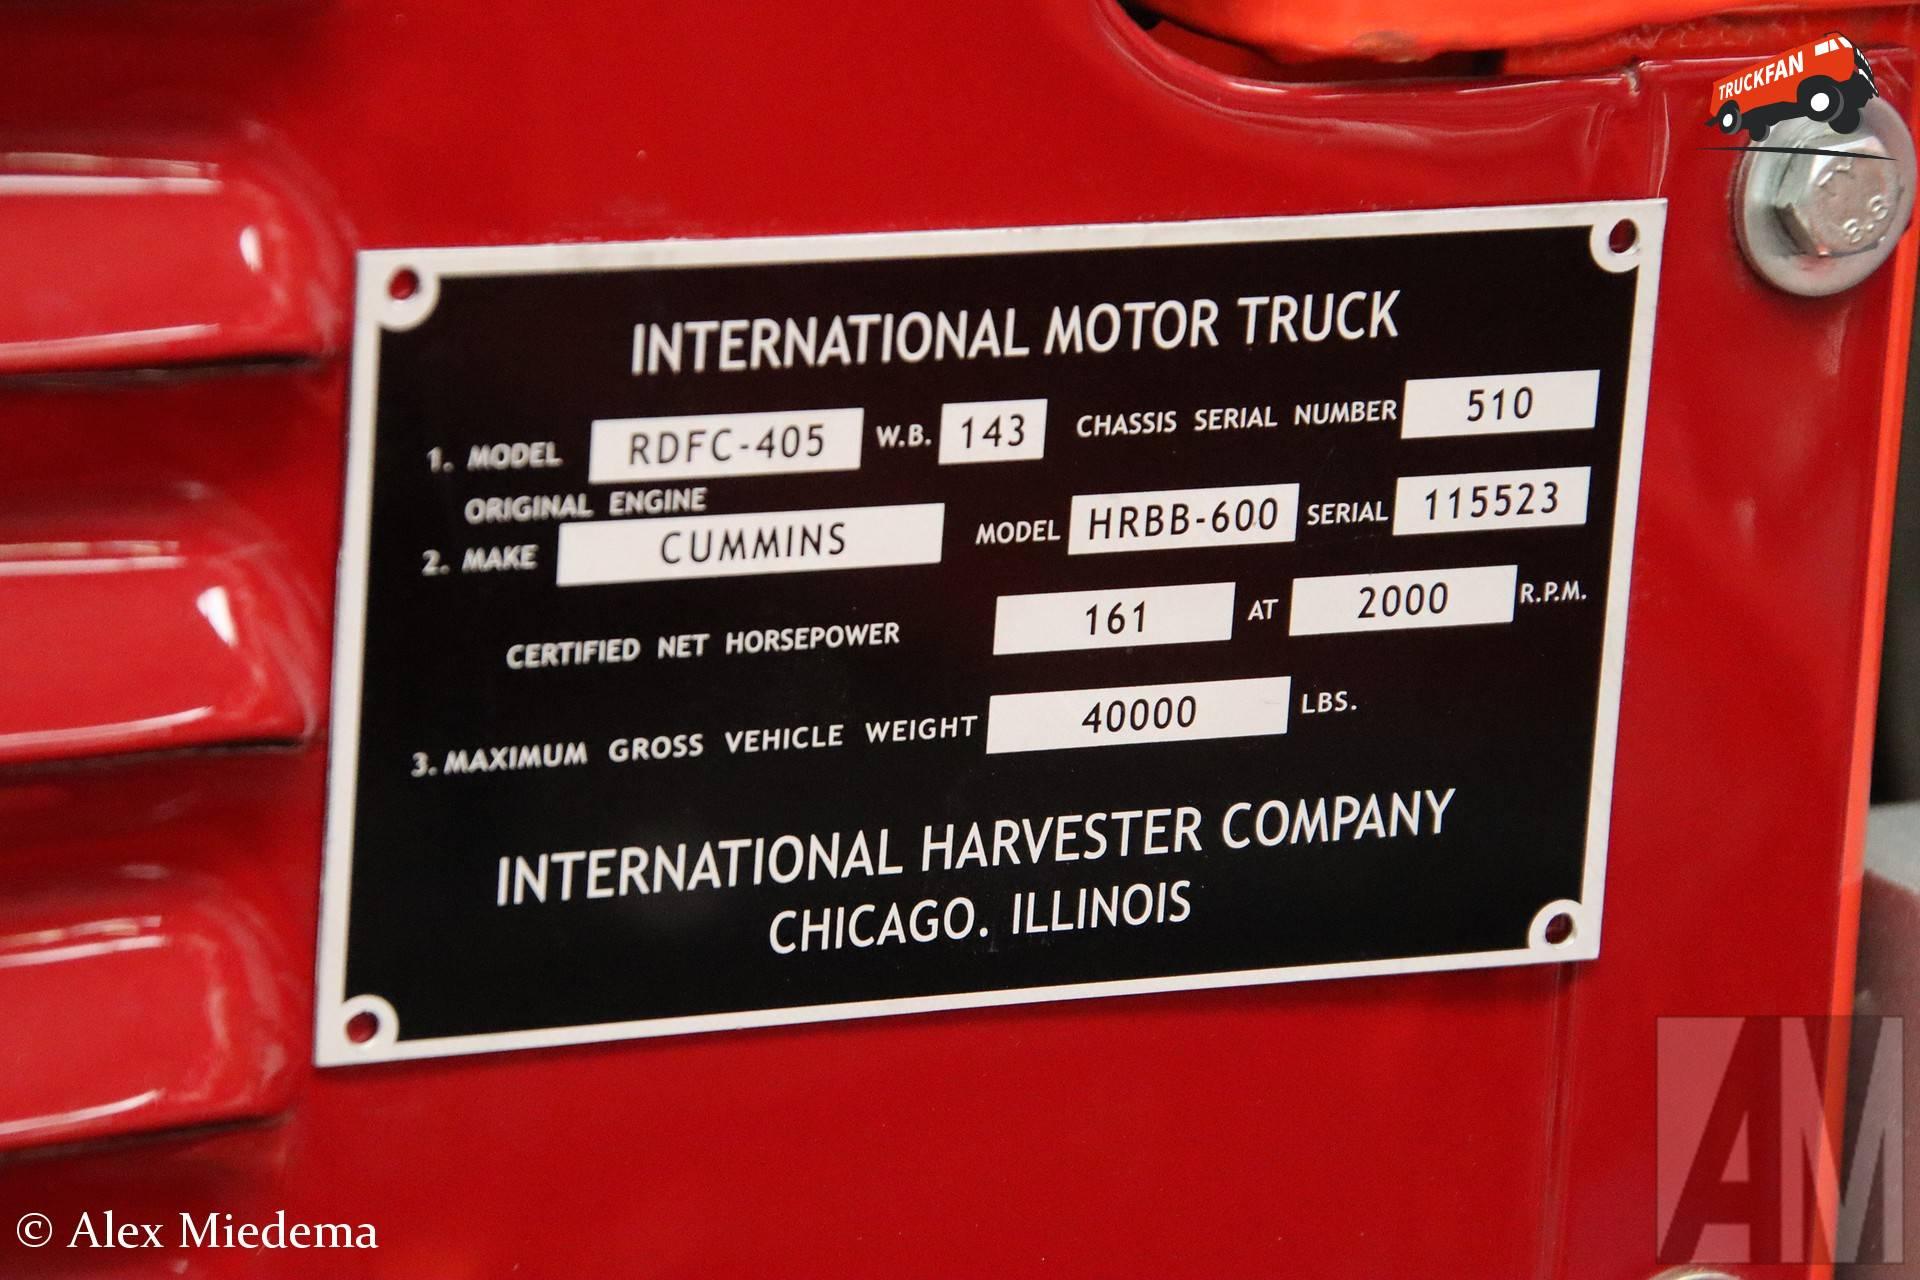 International RDFC-405